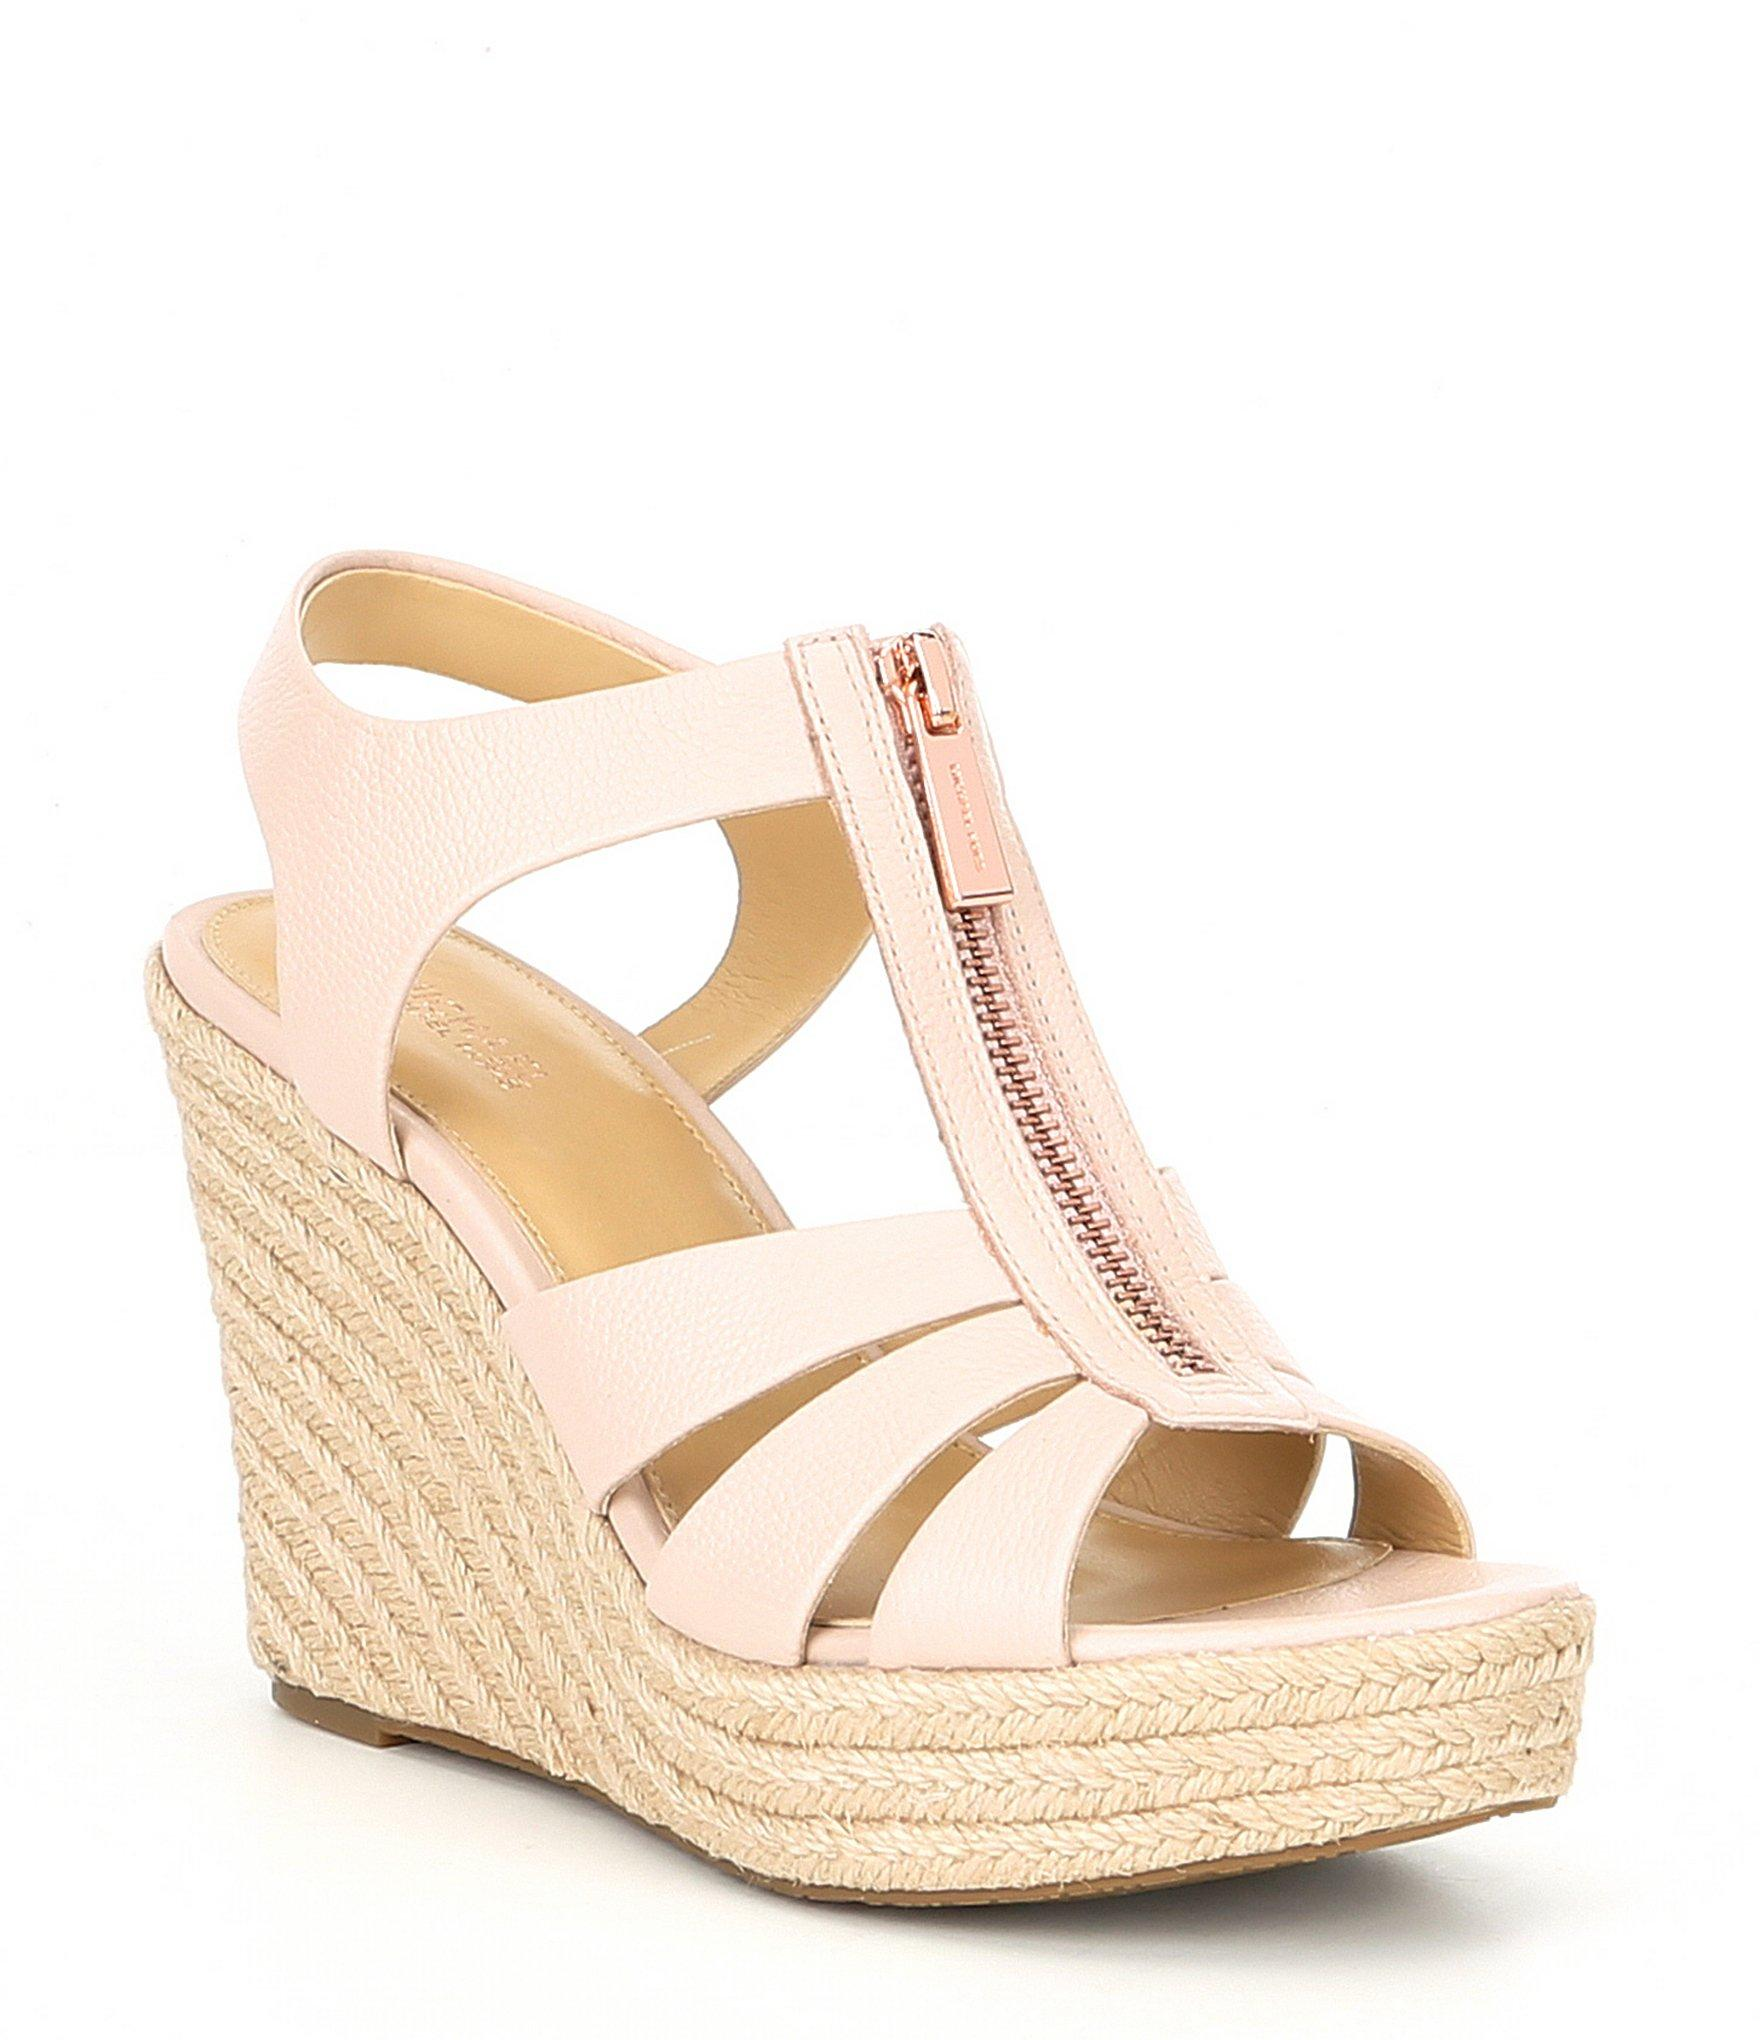 9f26361075b Lyst - Michael Michael Kors Berkley Espadrille Wedge Sandals in Pink